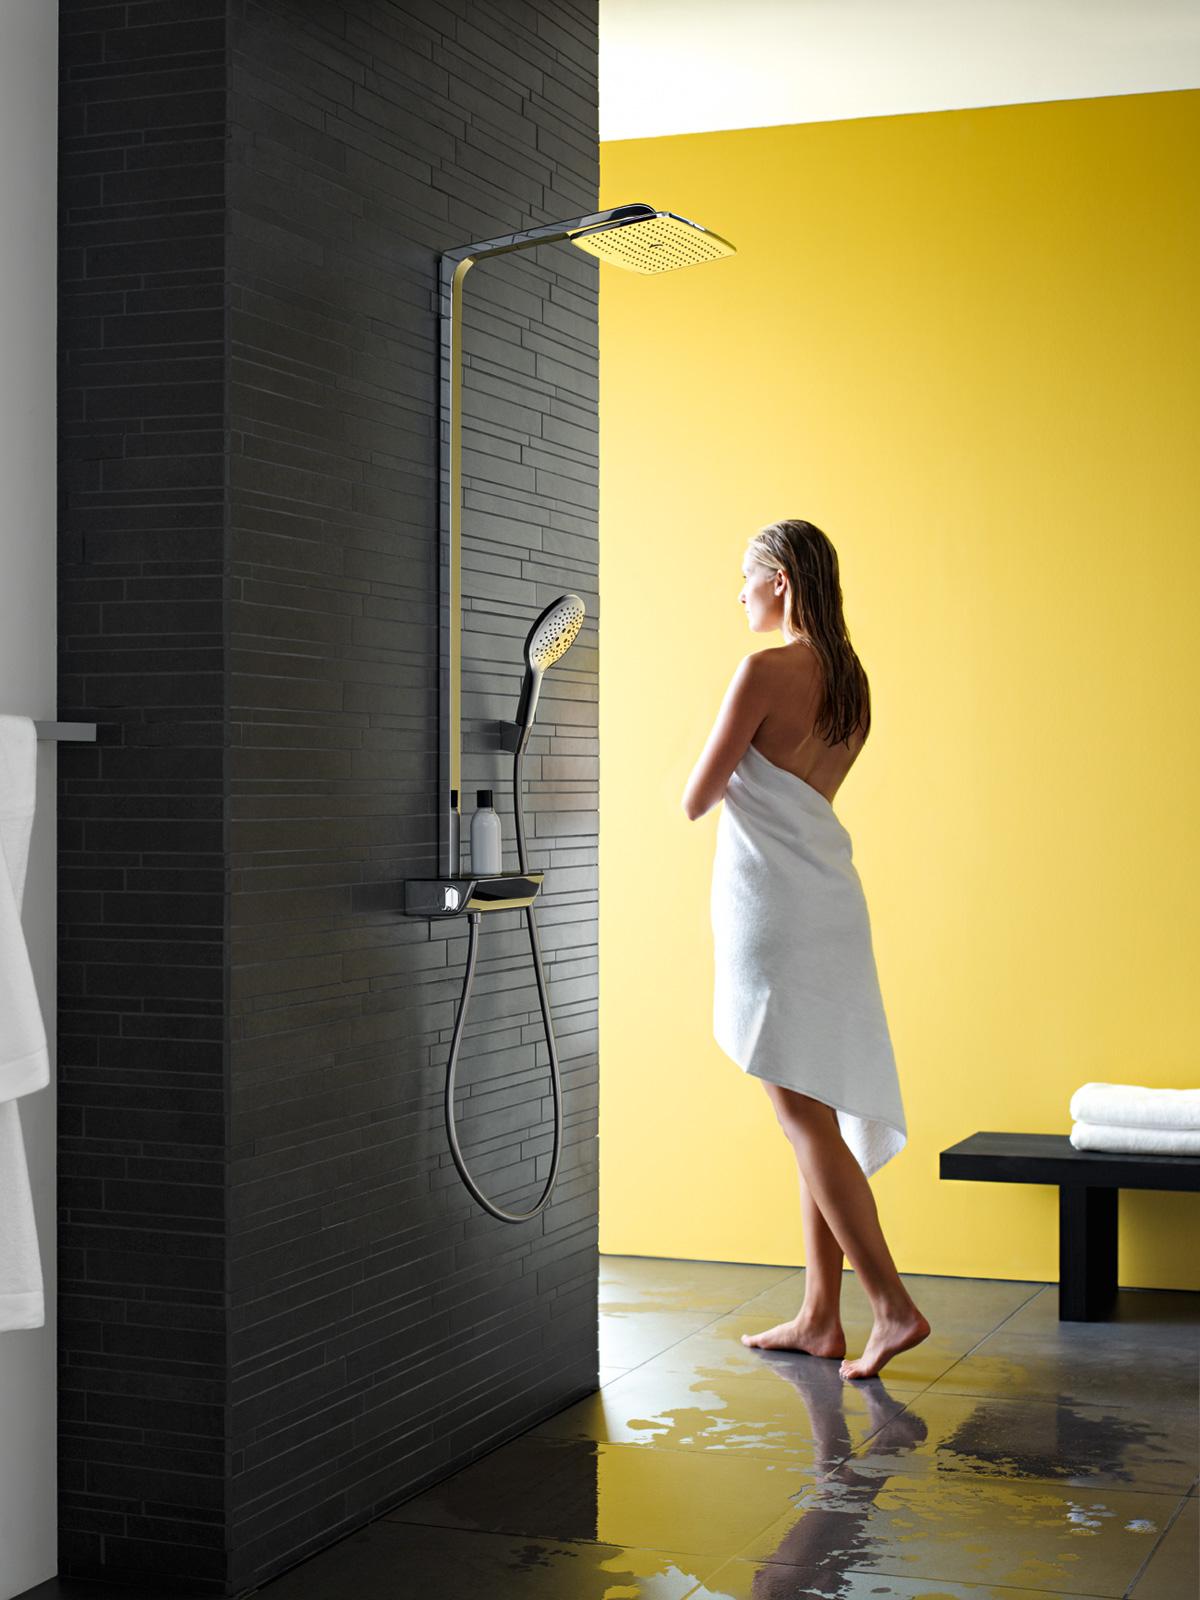 Showerpipe_074_Frau_ISOV2_72